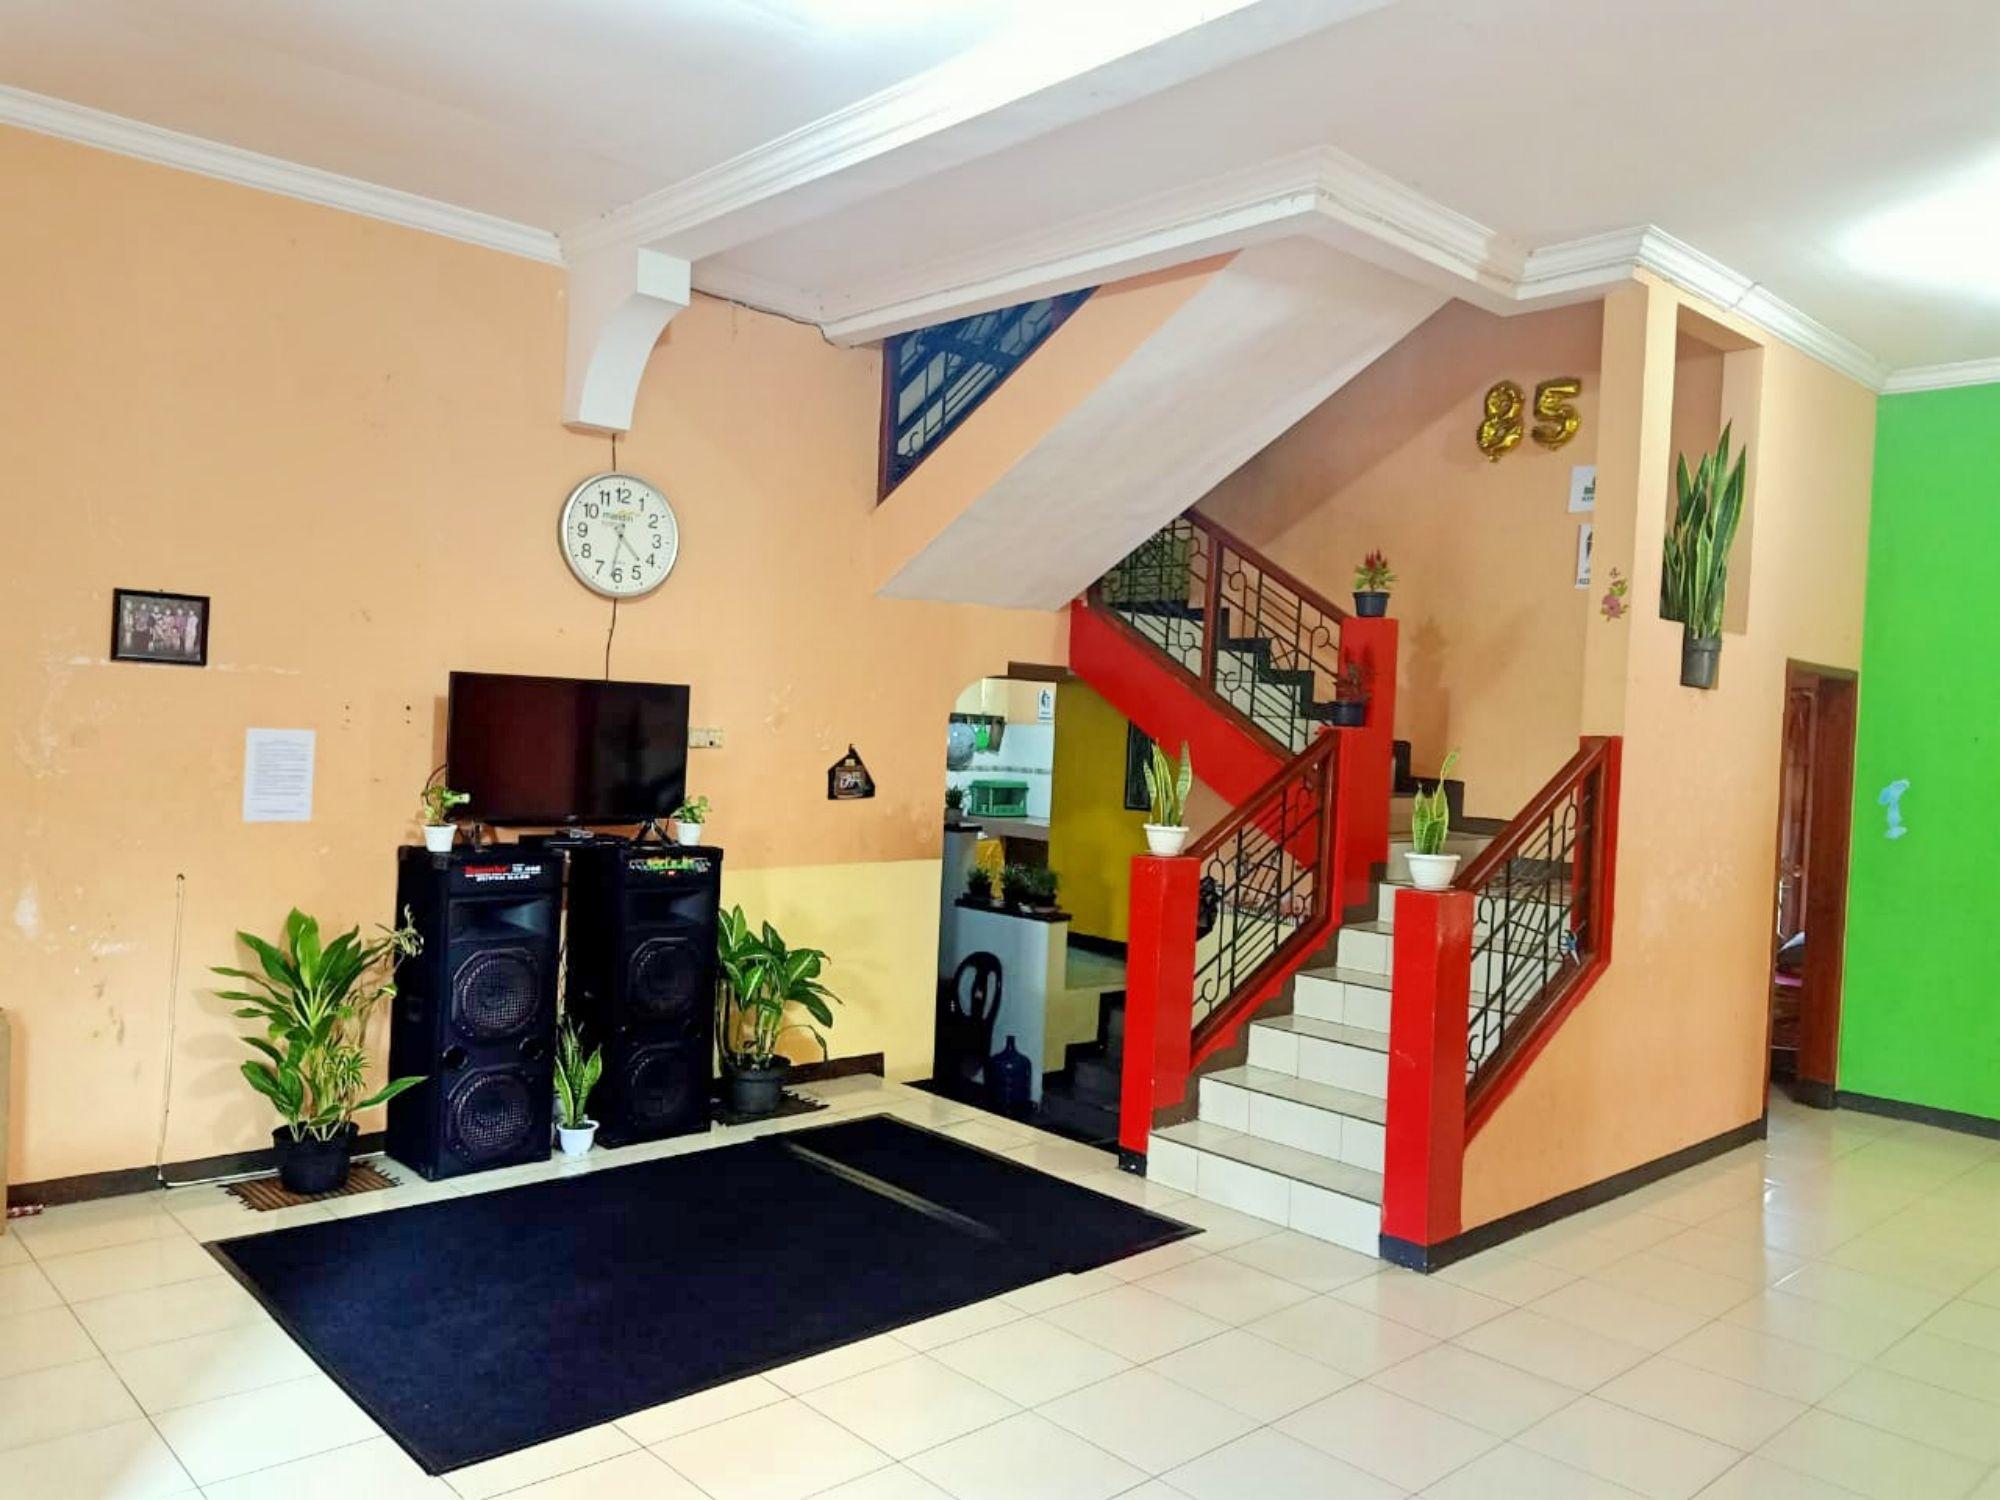 villa alfarizi pacet ruang tengah luas dilengkapi televisi LED dan karaoke